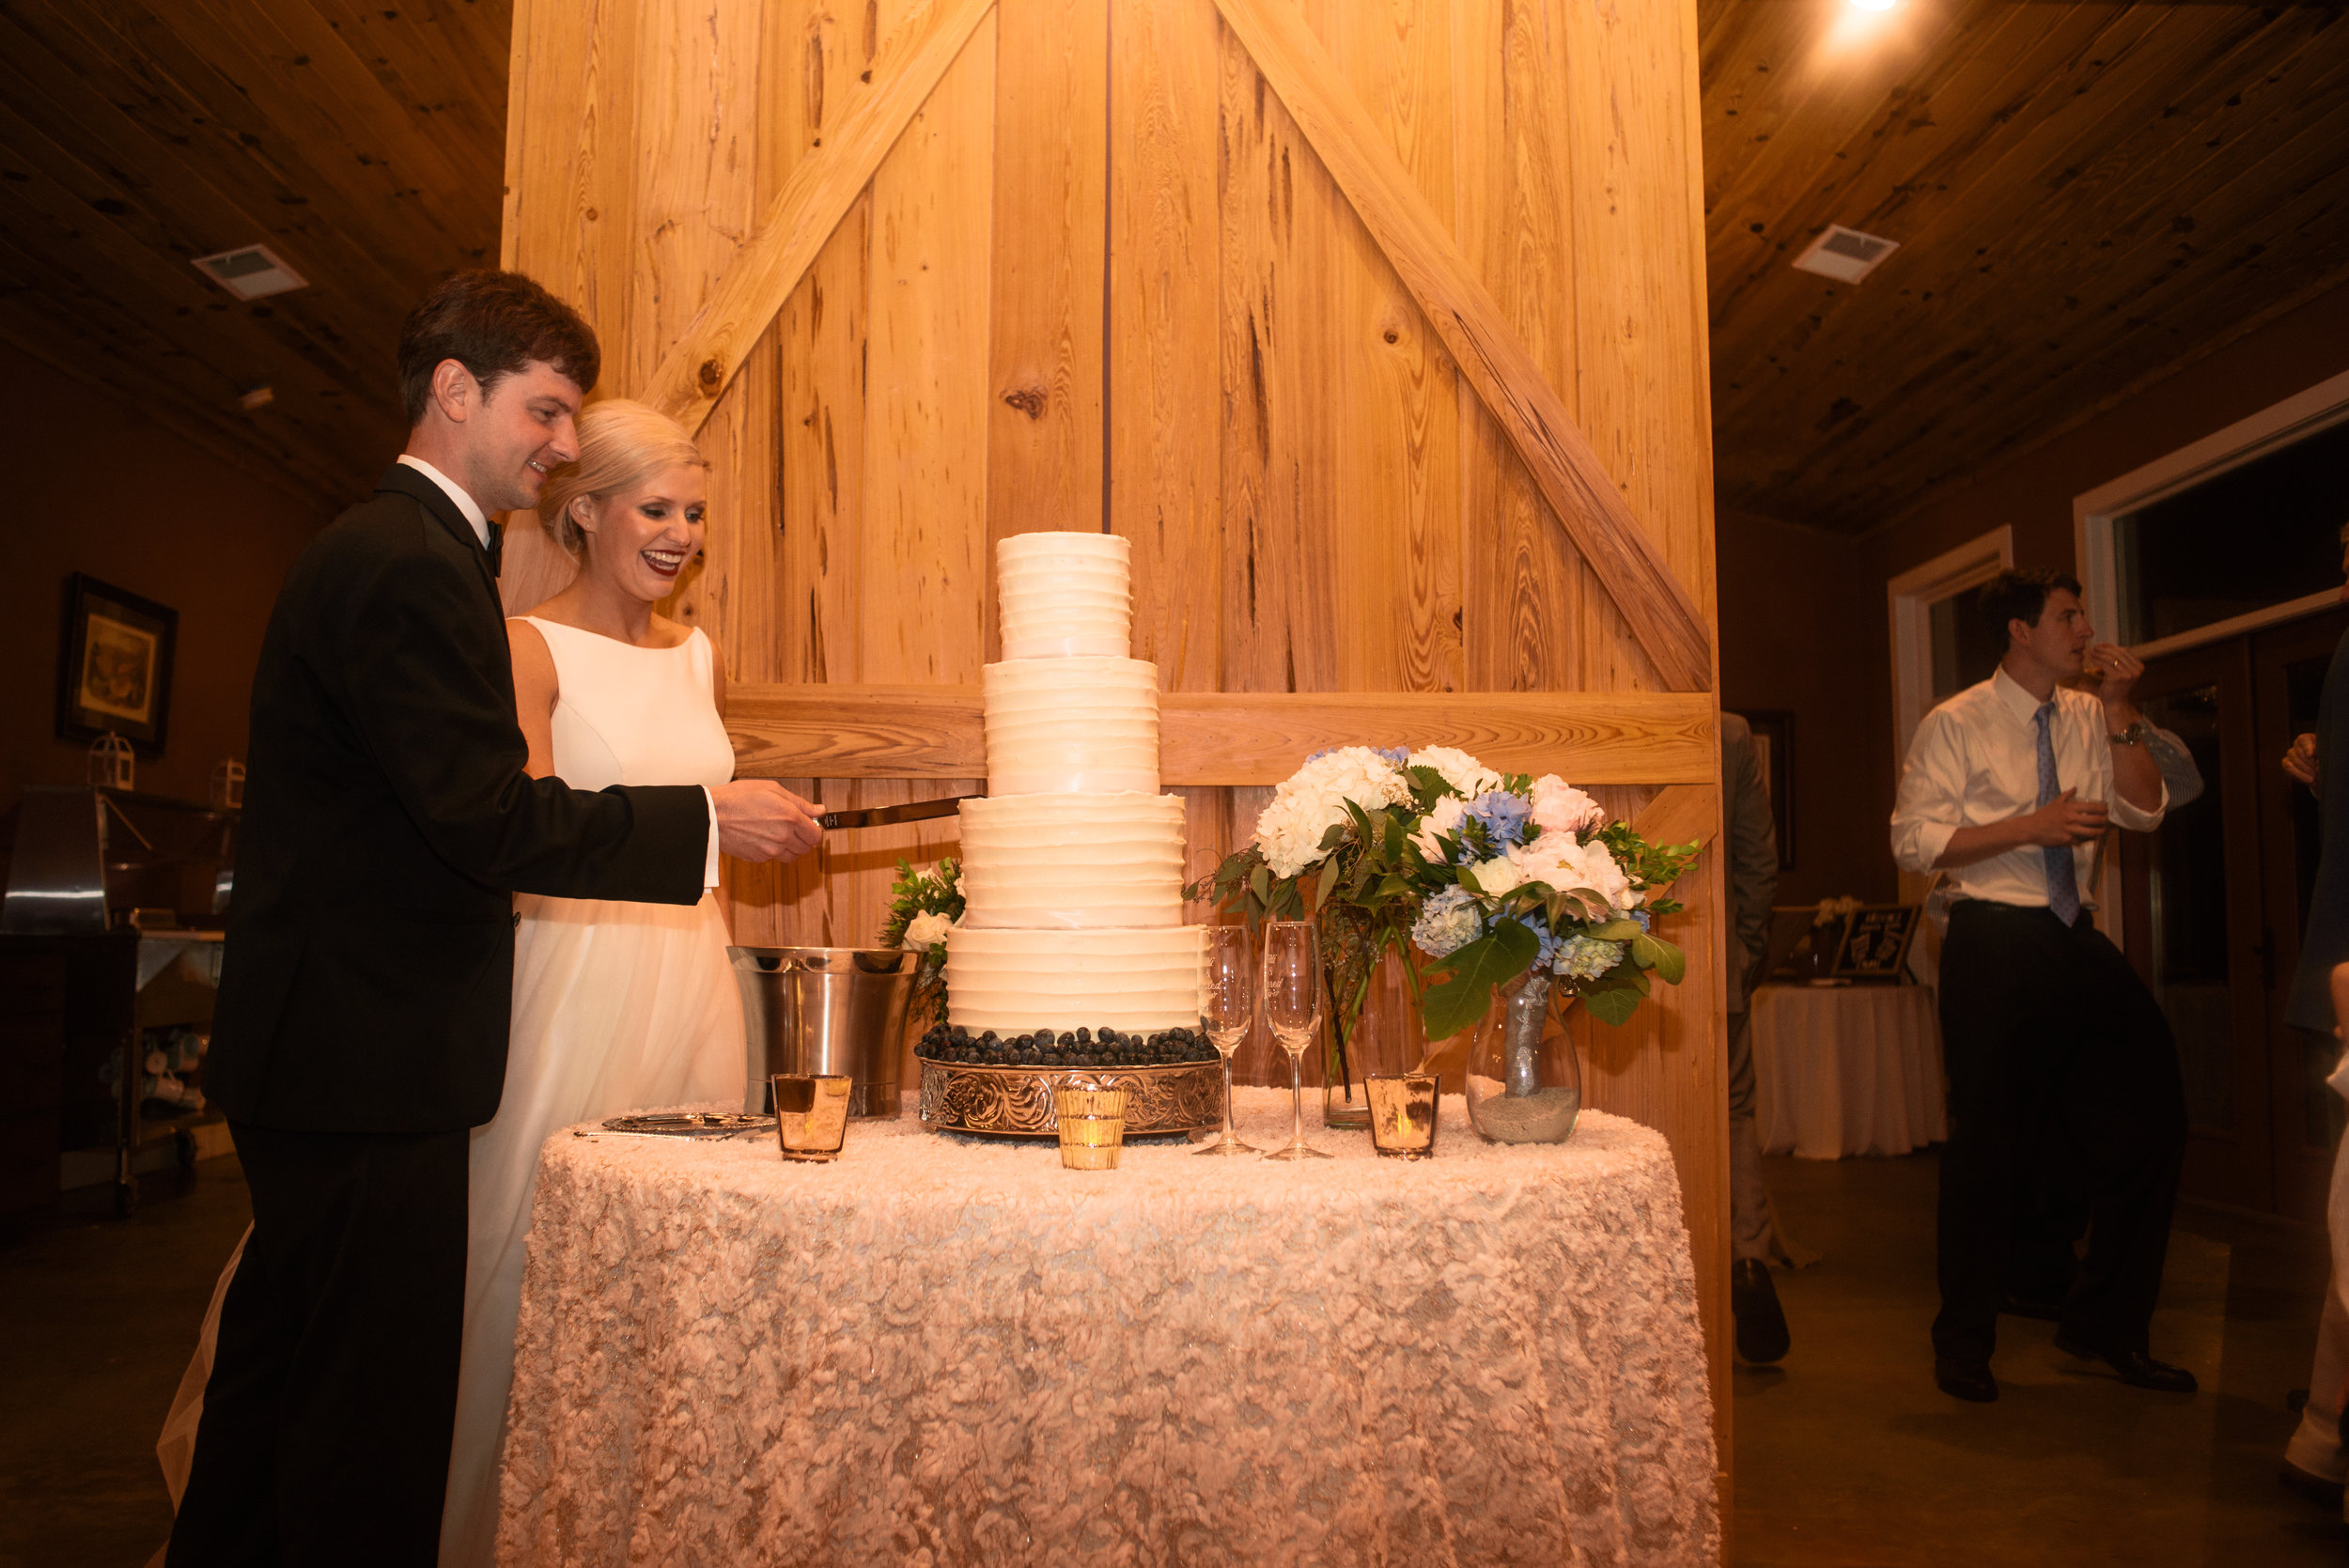 ali-and-jared-savannah-georgia-may-2017-wedding-meg-hill-photo-(735of760).jpg